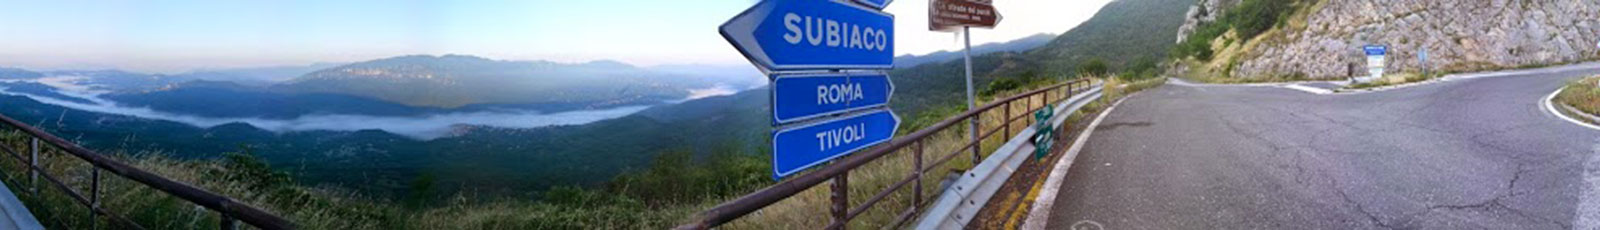 Bivio di Cervara Subiaco Roma Tivoli